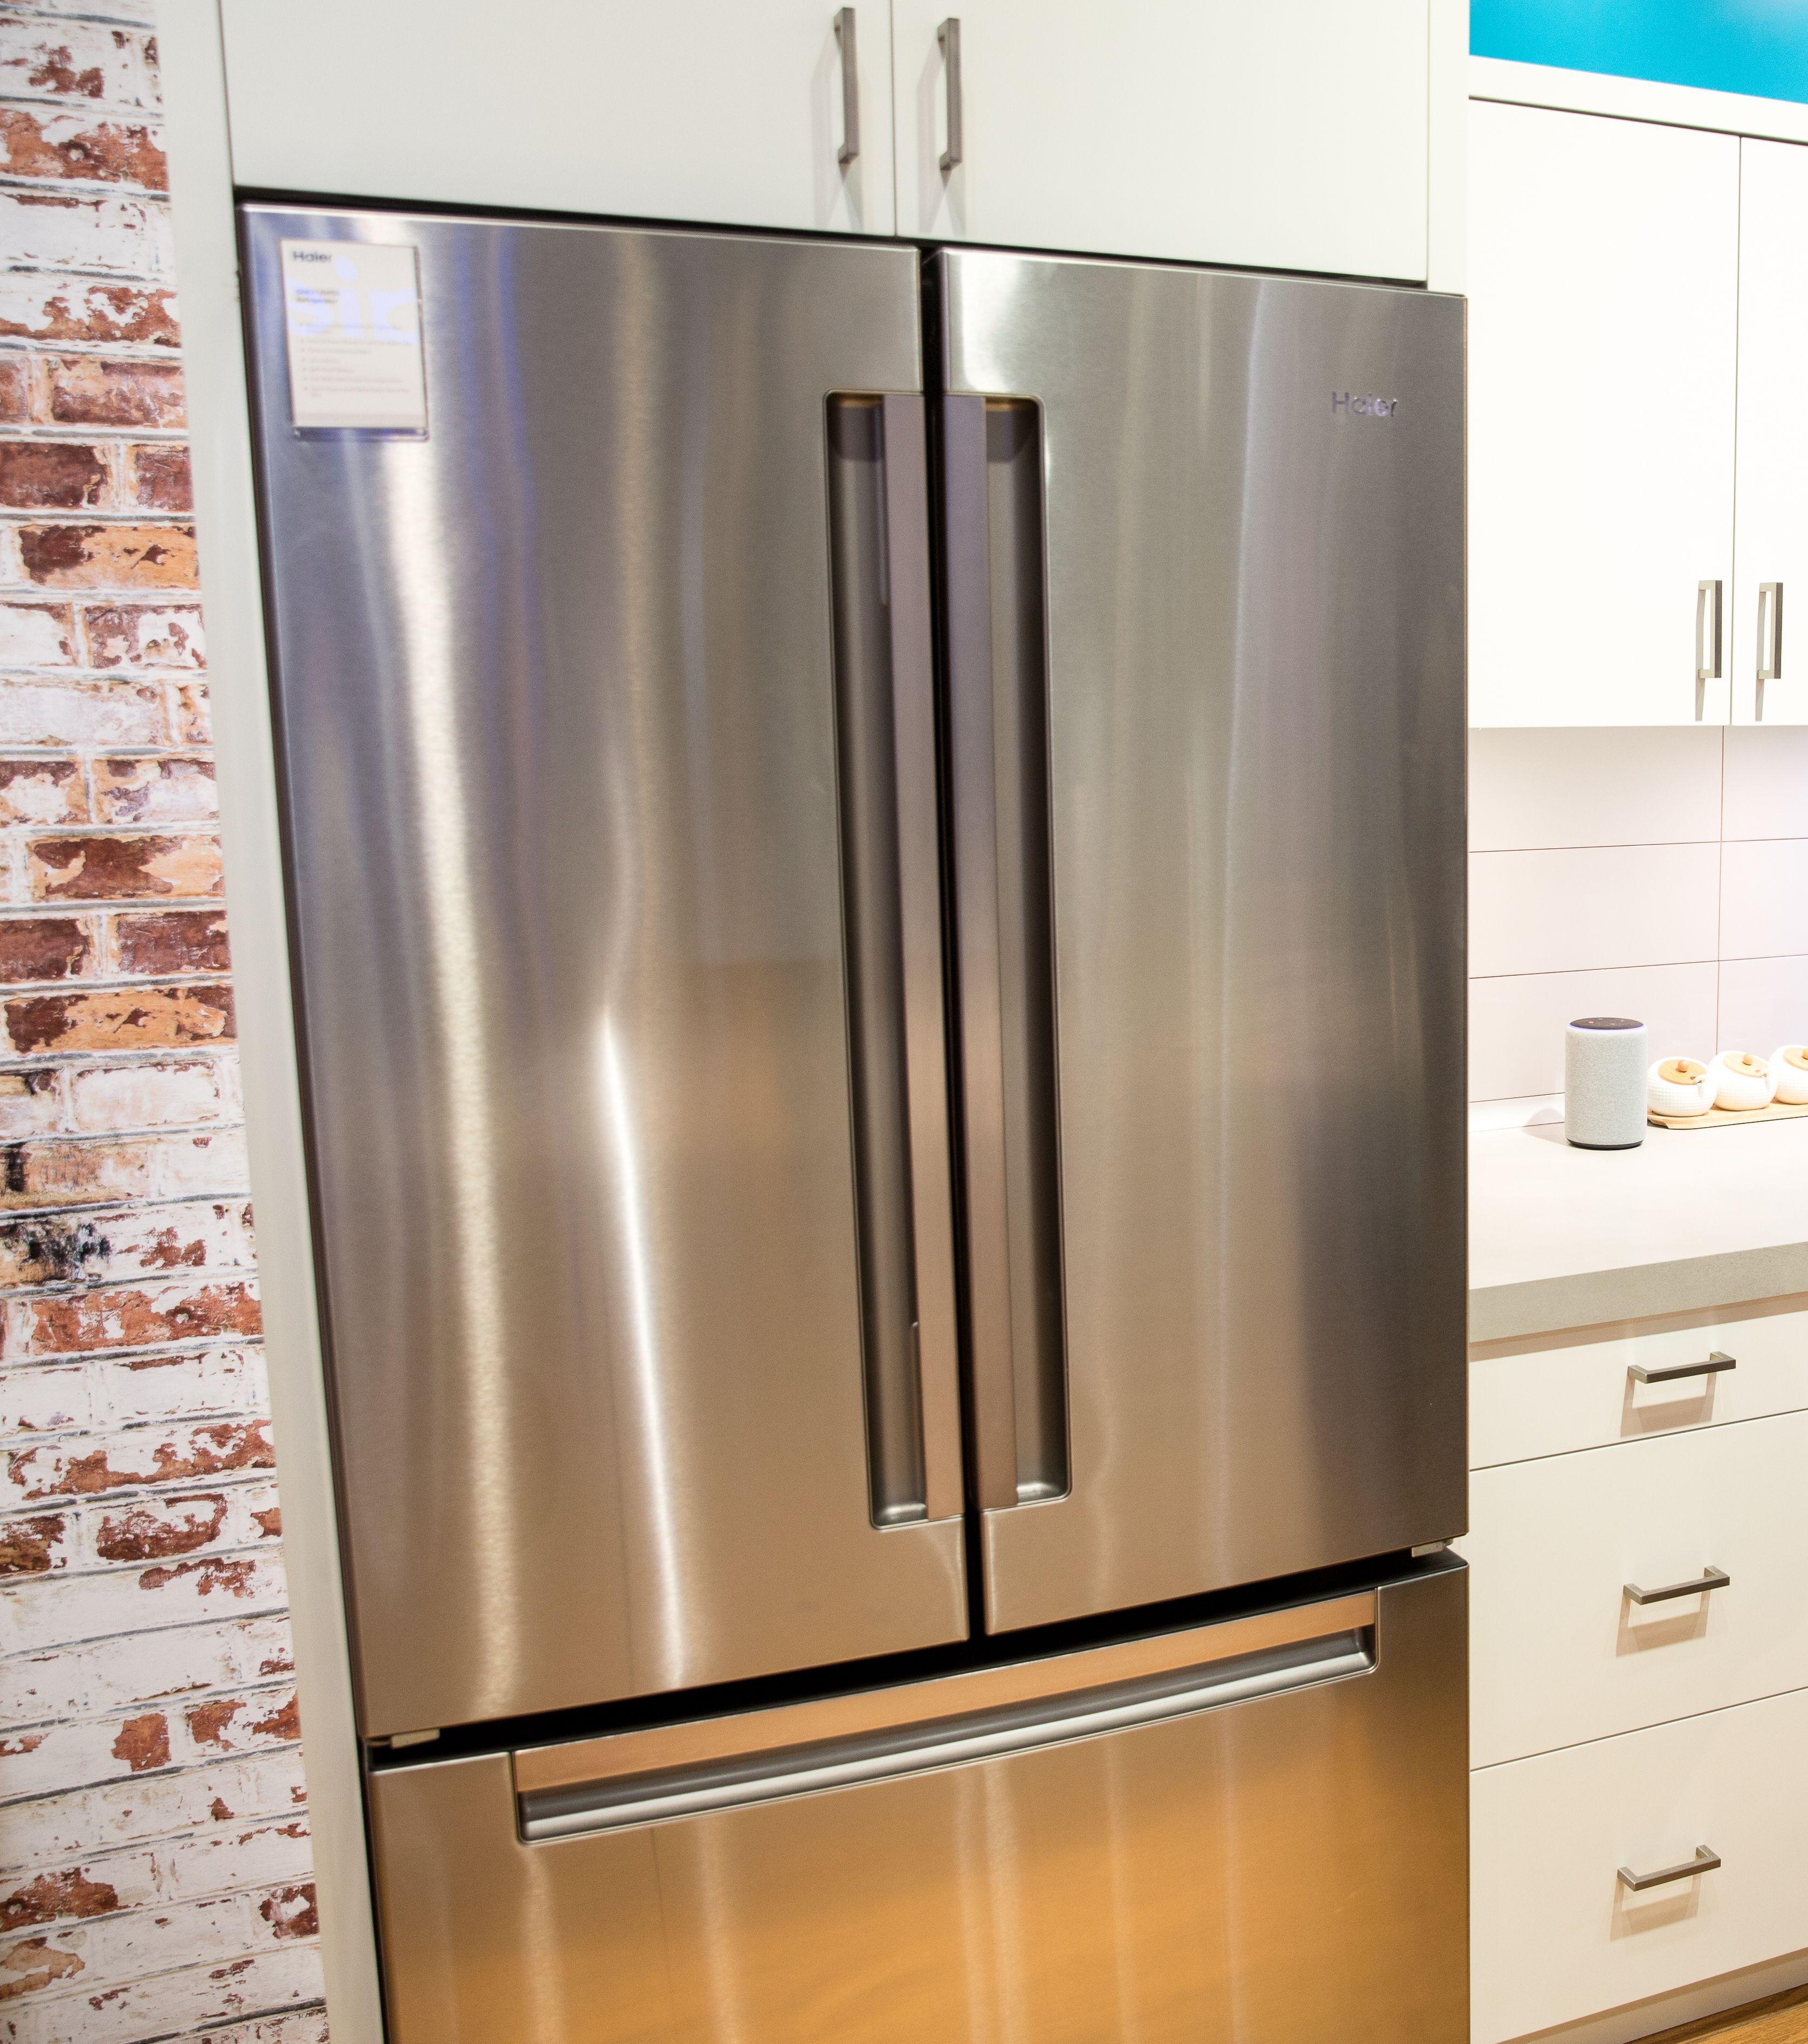 41++ Why isn t my fridge making ice information